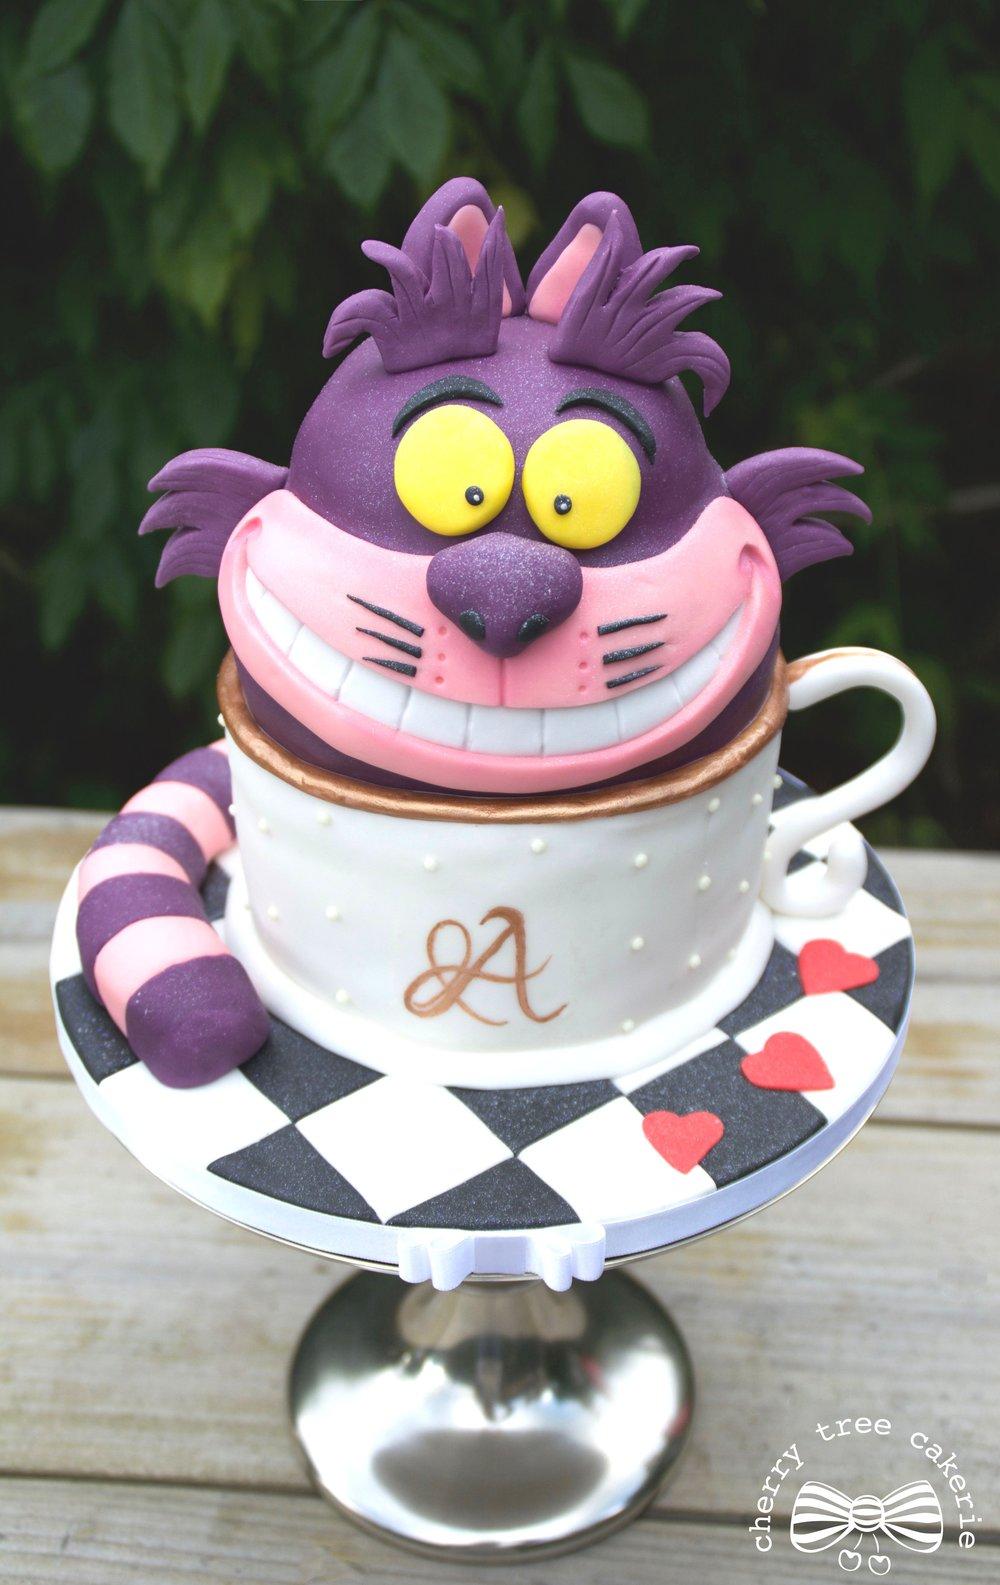 Alice-in-Wonderland-Cheshire-Cat-cake